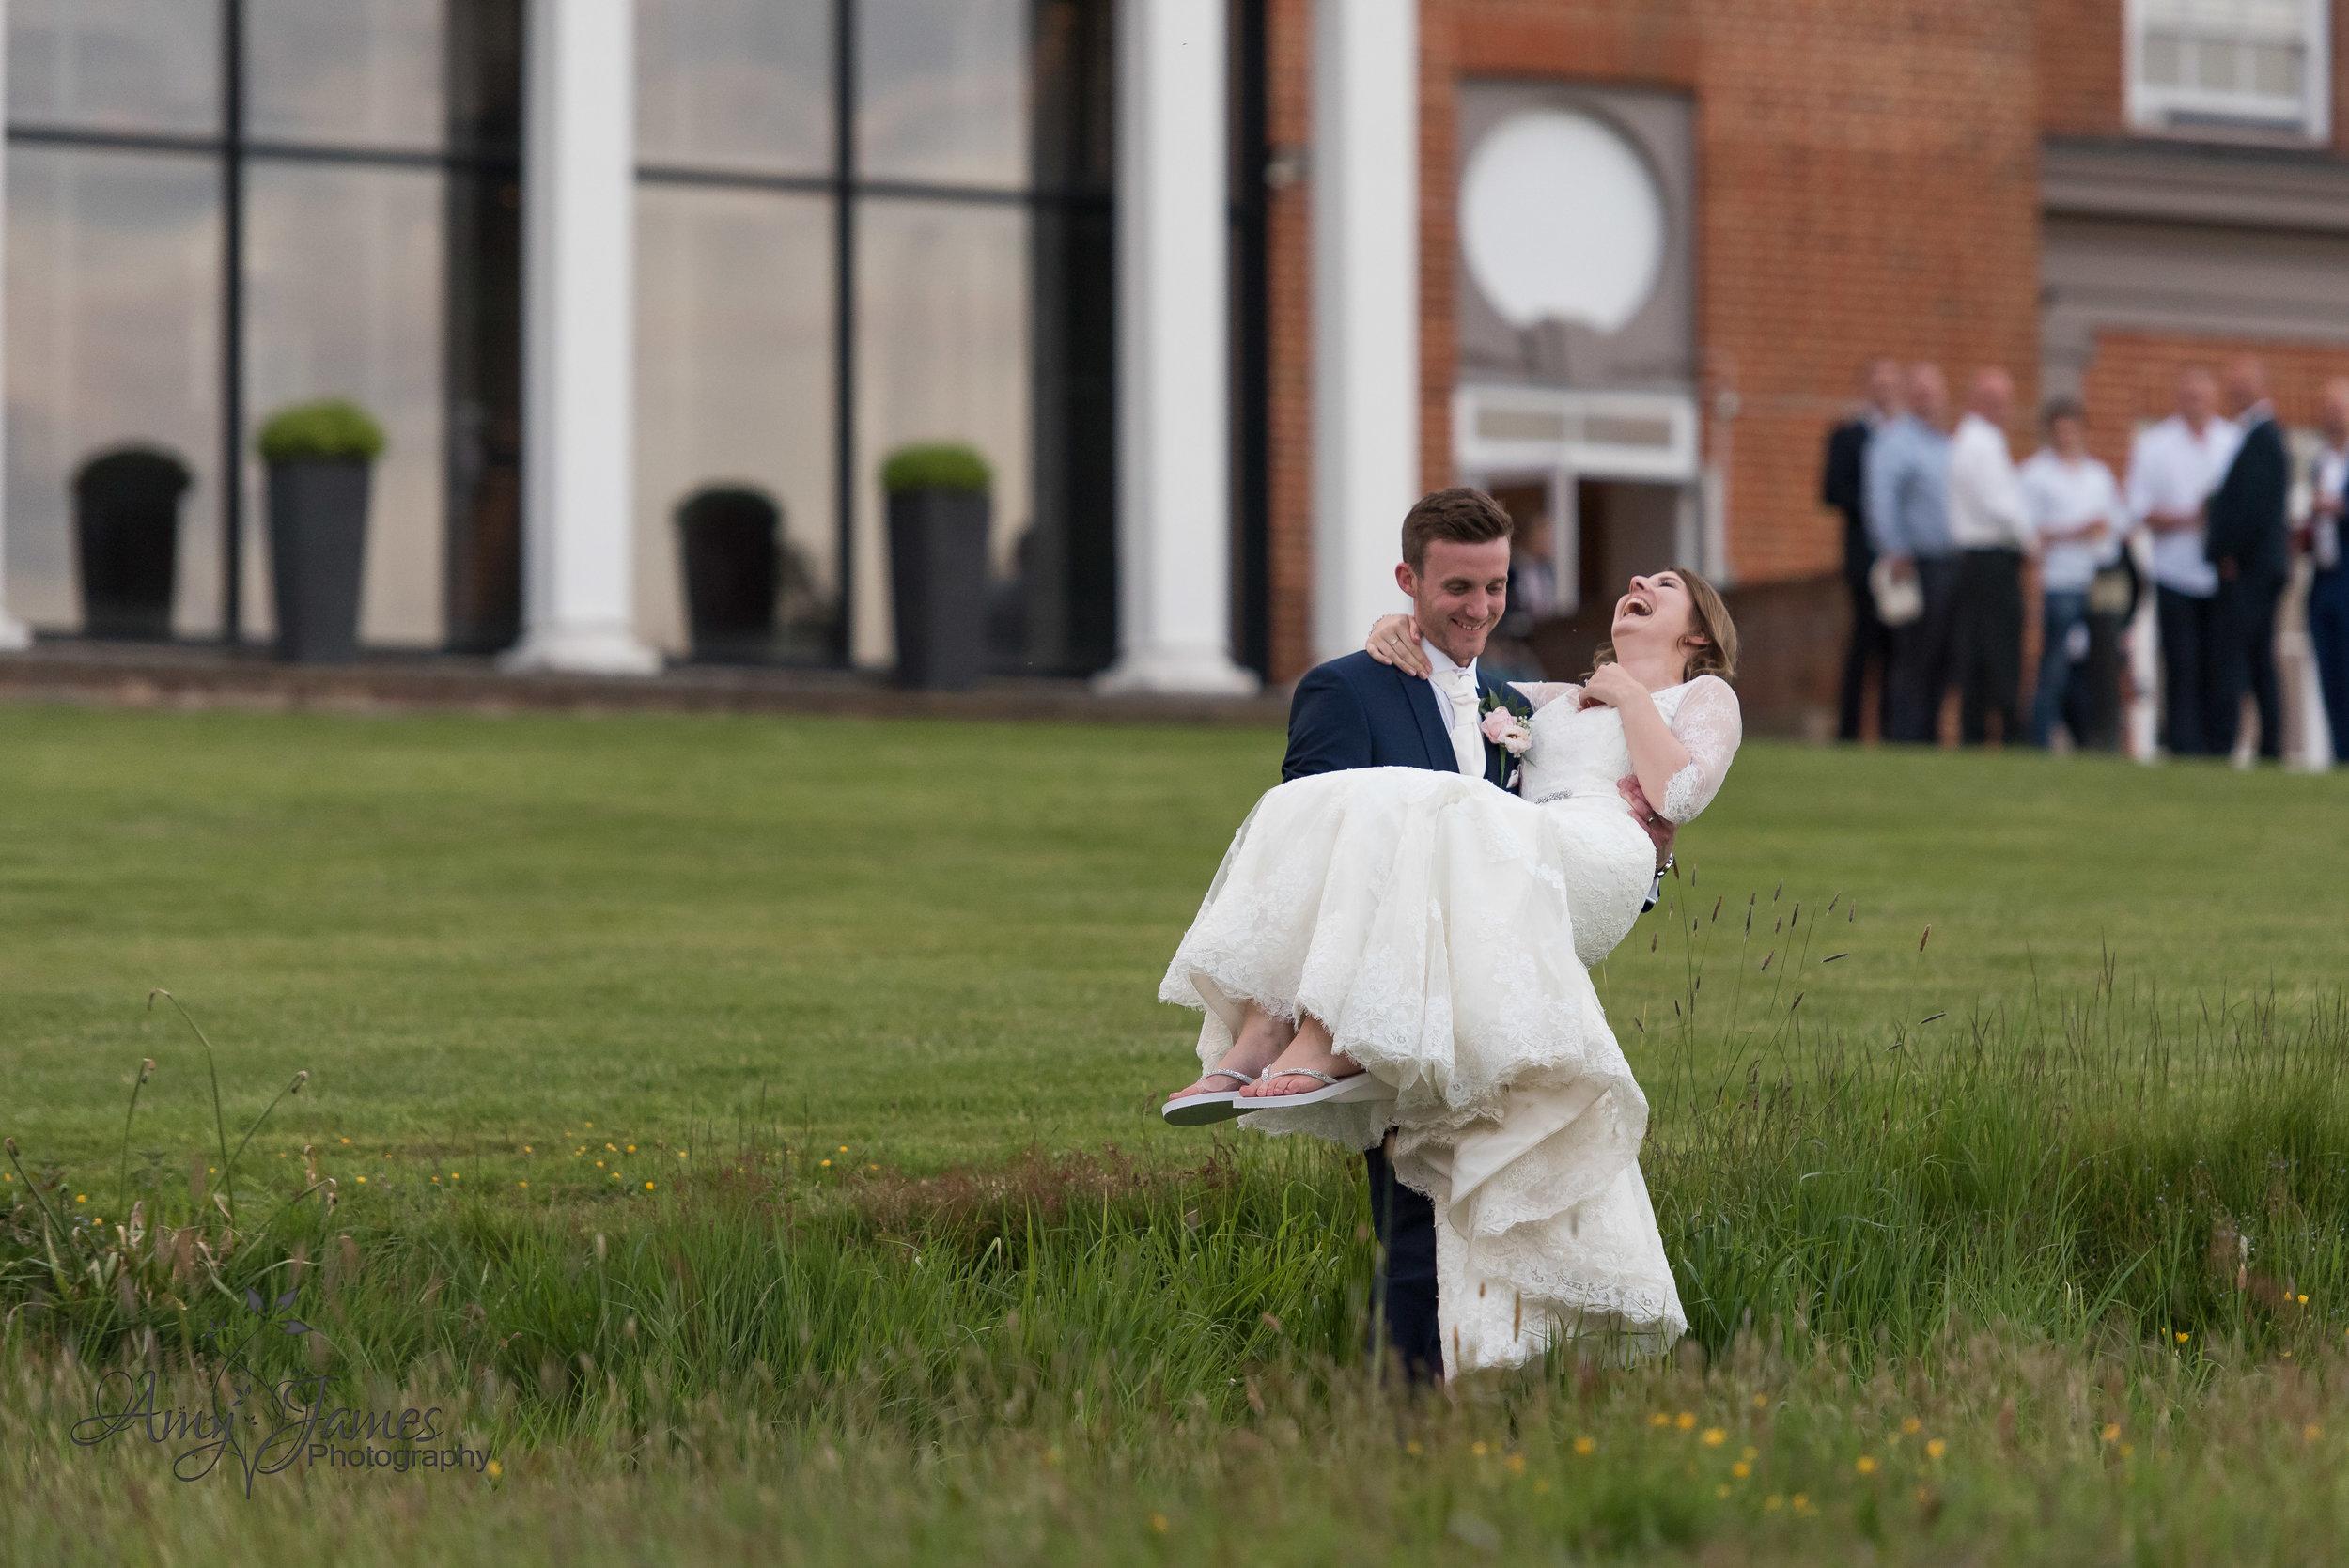 Northbrook Park Wedding Photographer | Amy James Photography | Hampshire wedding photographer